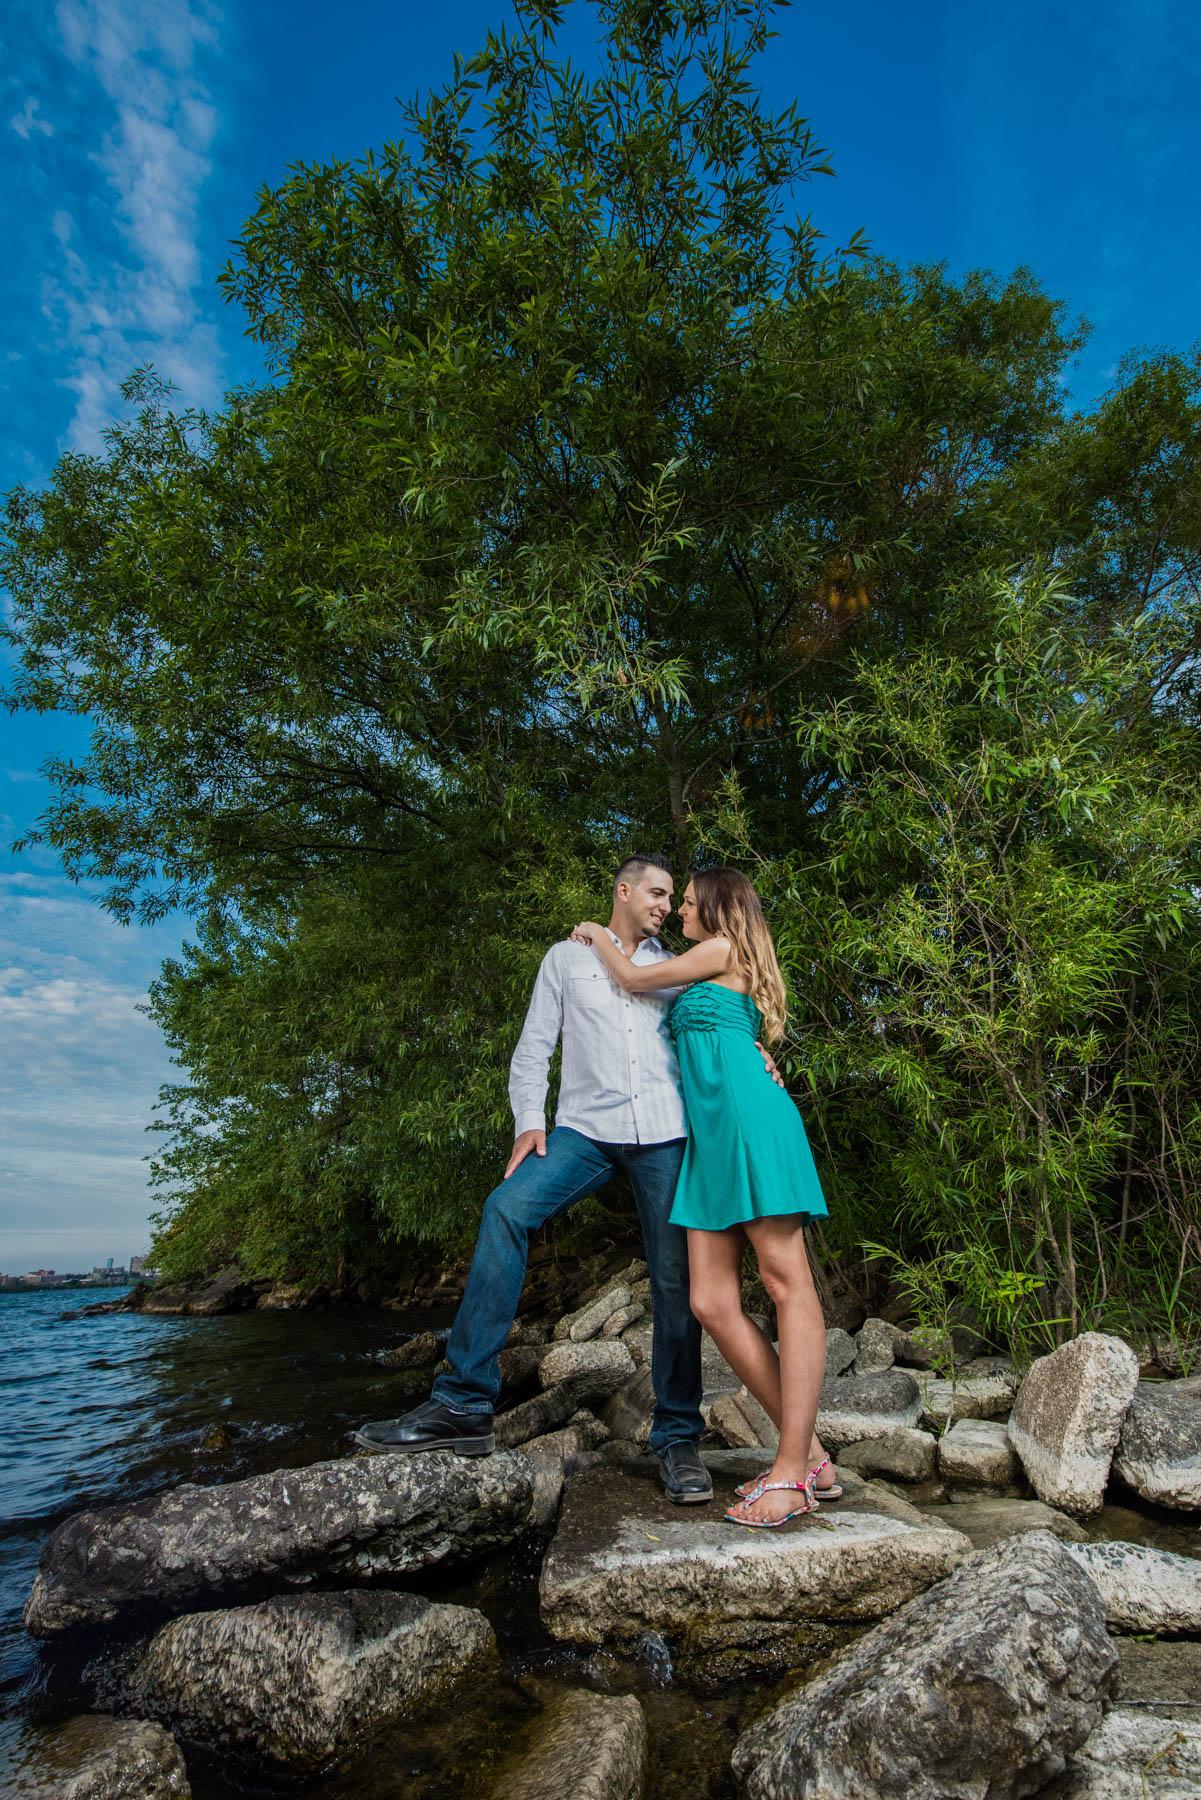 044 - Engagement CJ Humber Bay Park